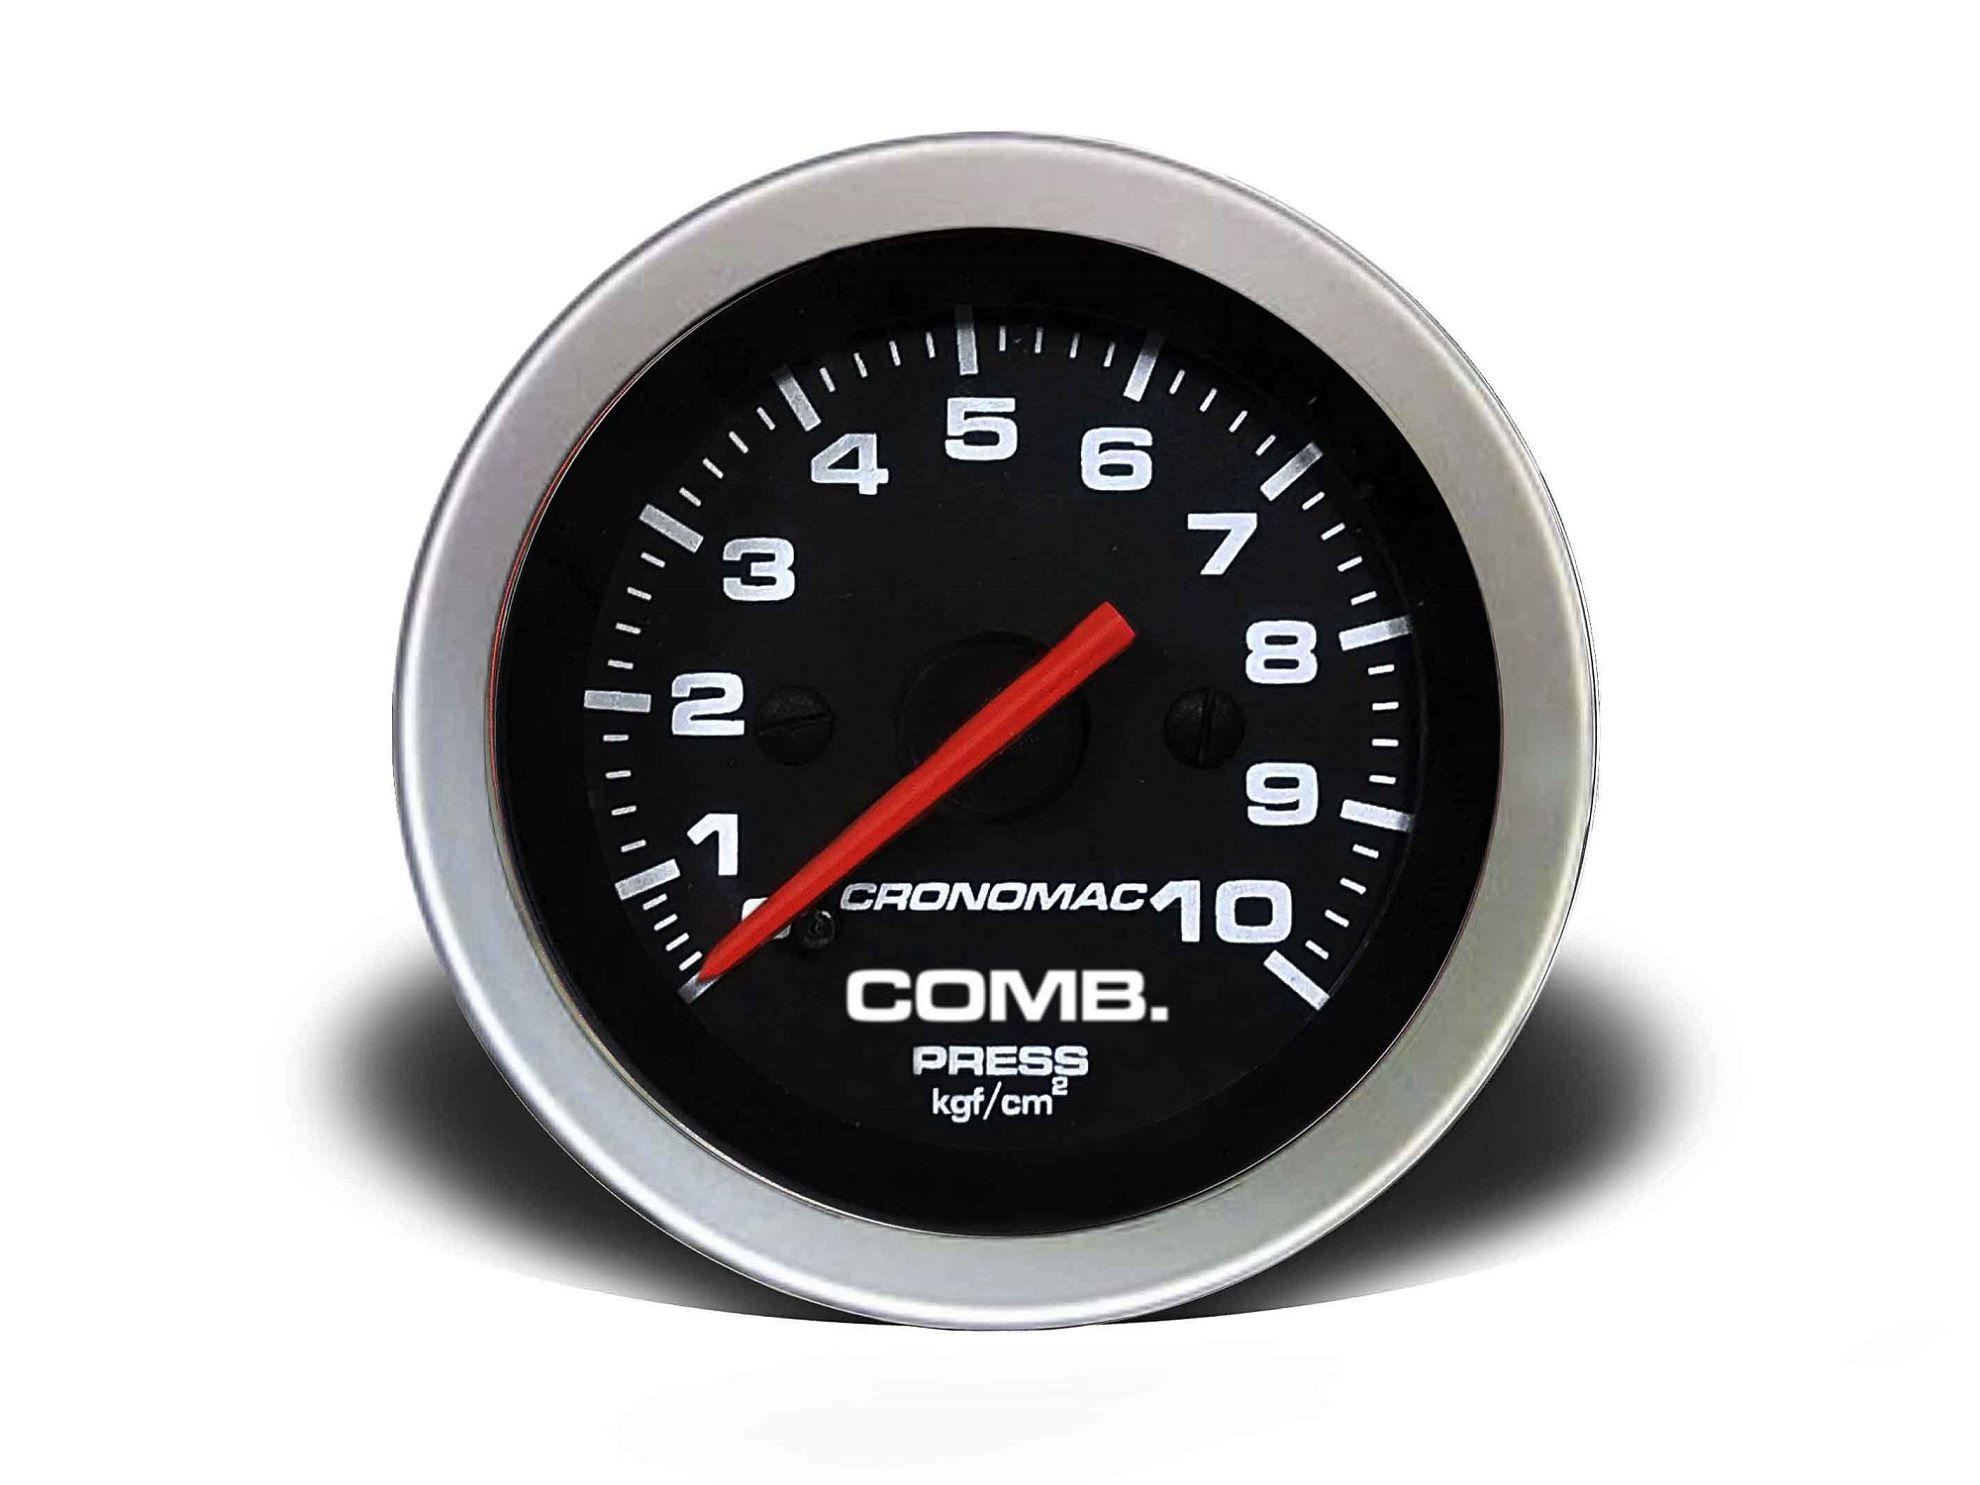 Relogio Pressao de Comb. 10kg Sport 52mm Cronomac